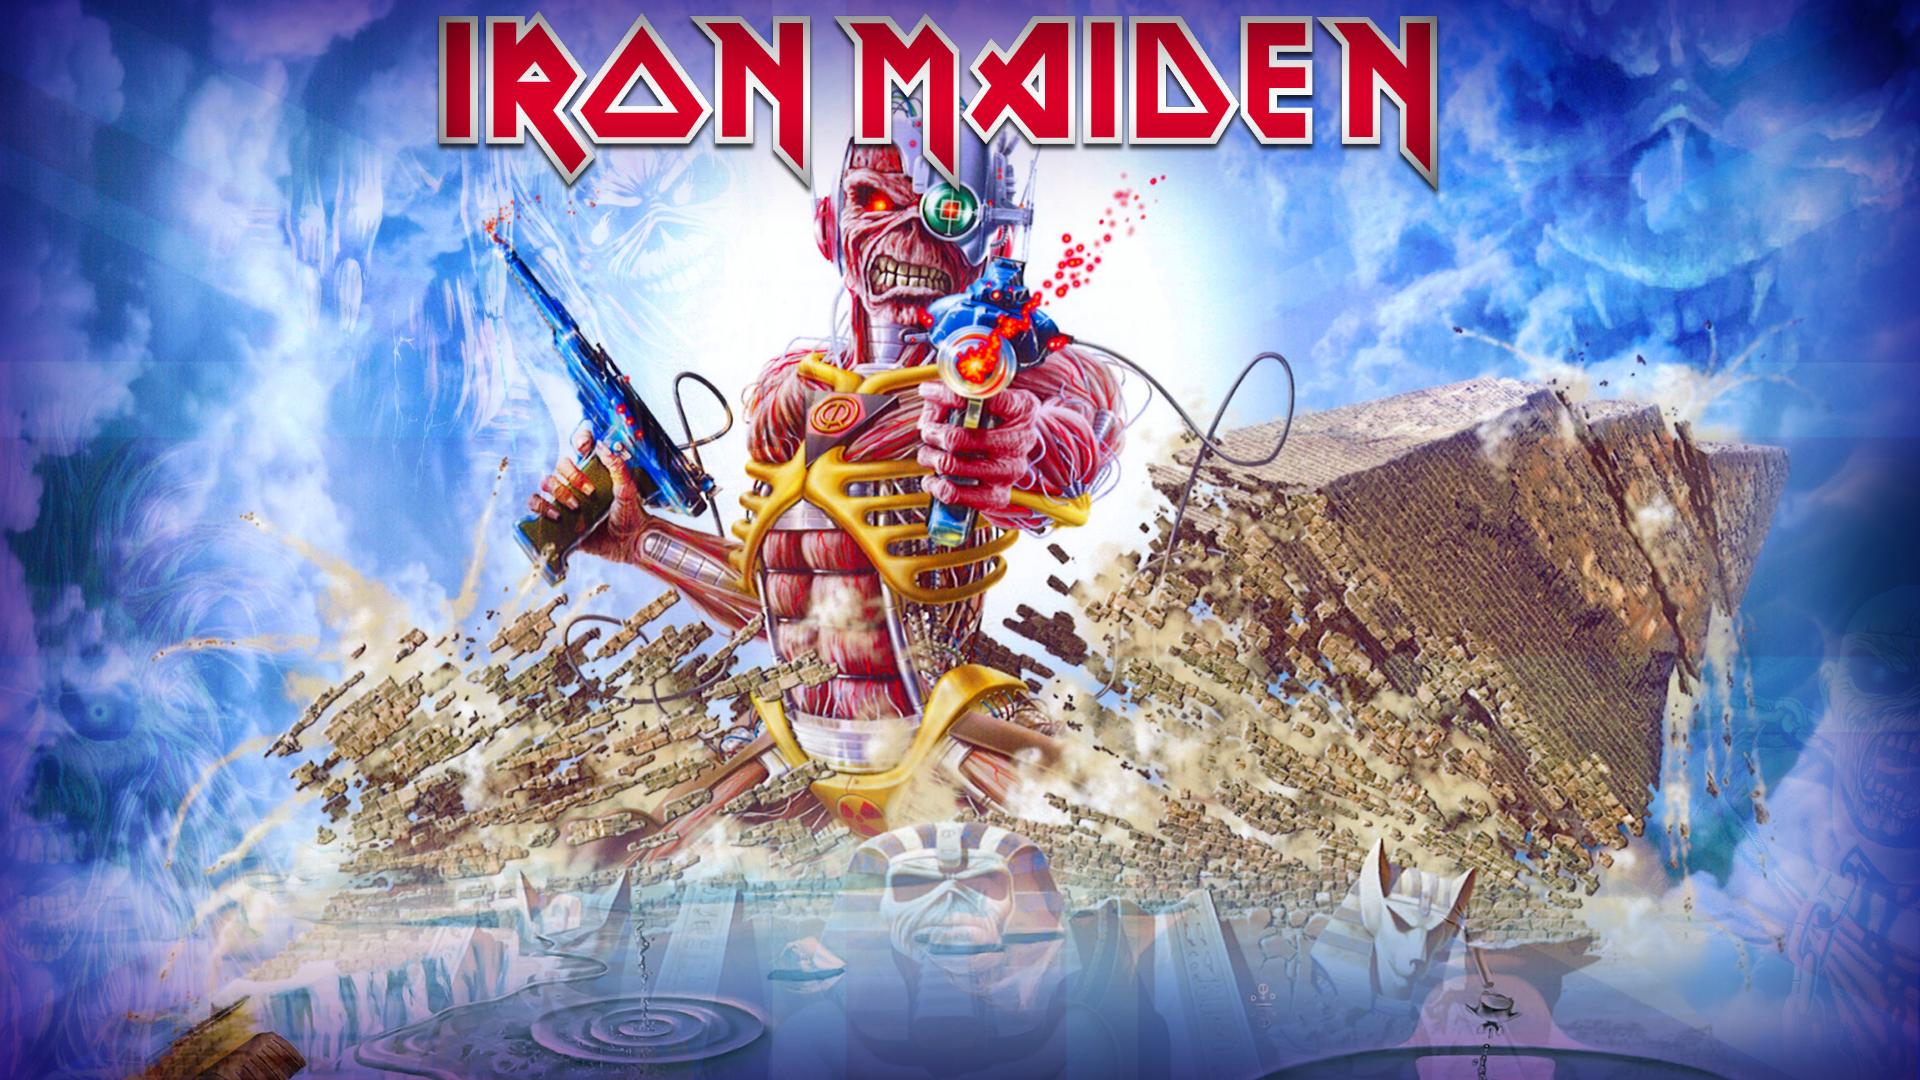 Iron Maiden Wallpapers 1920x1080